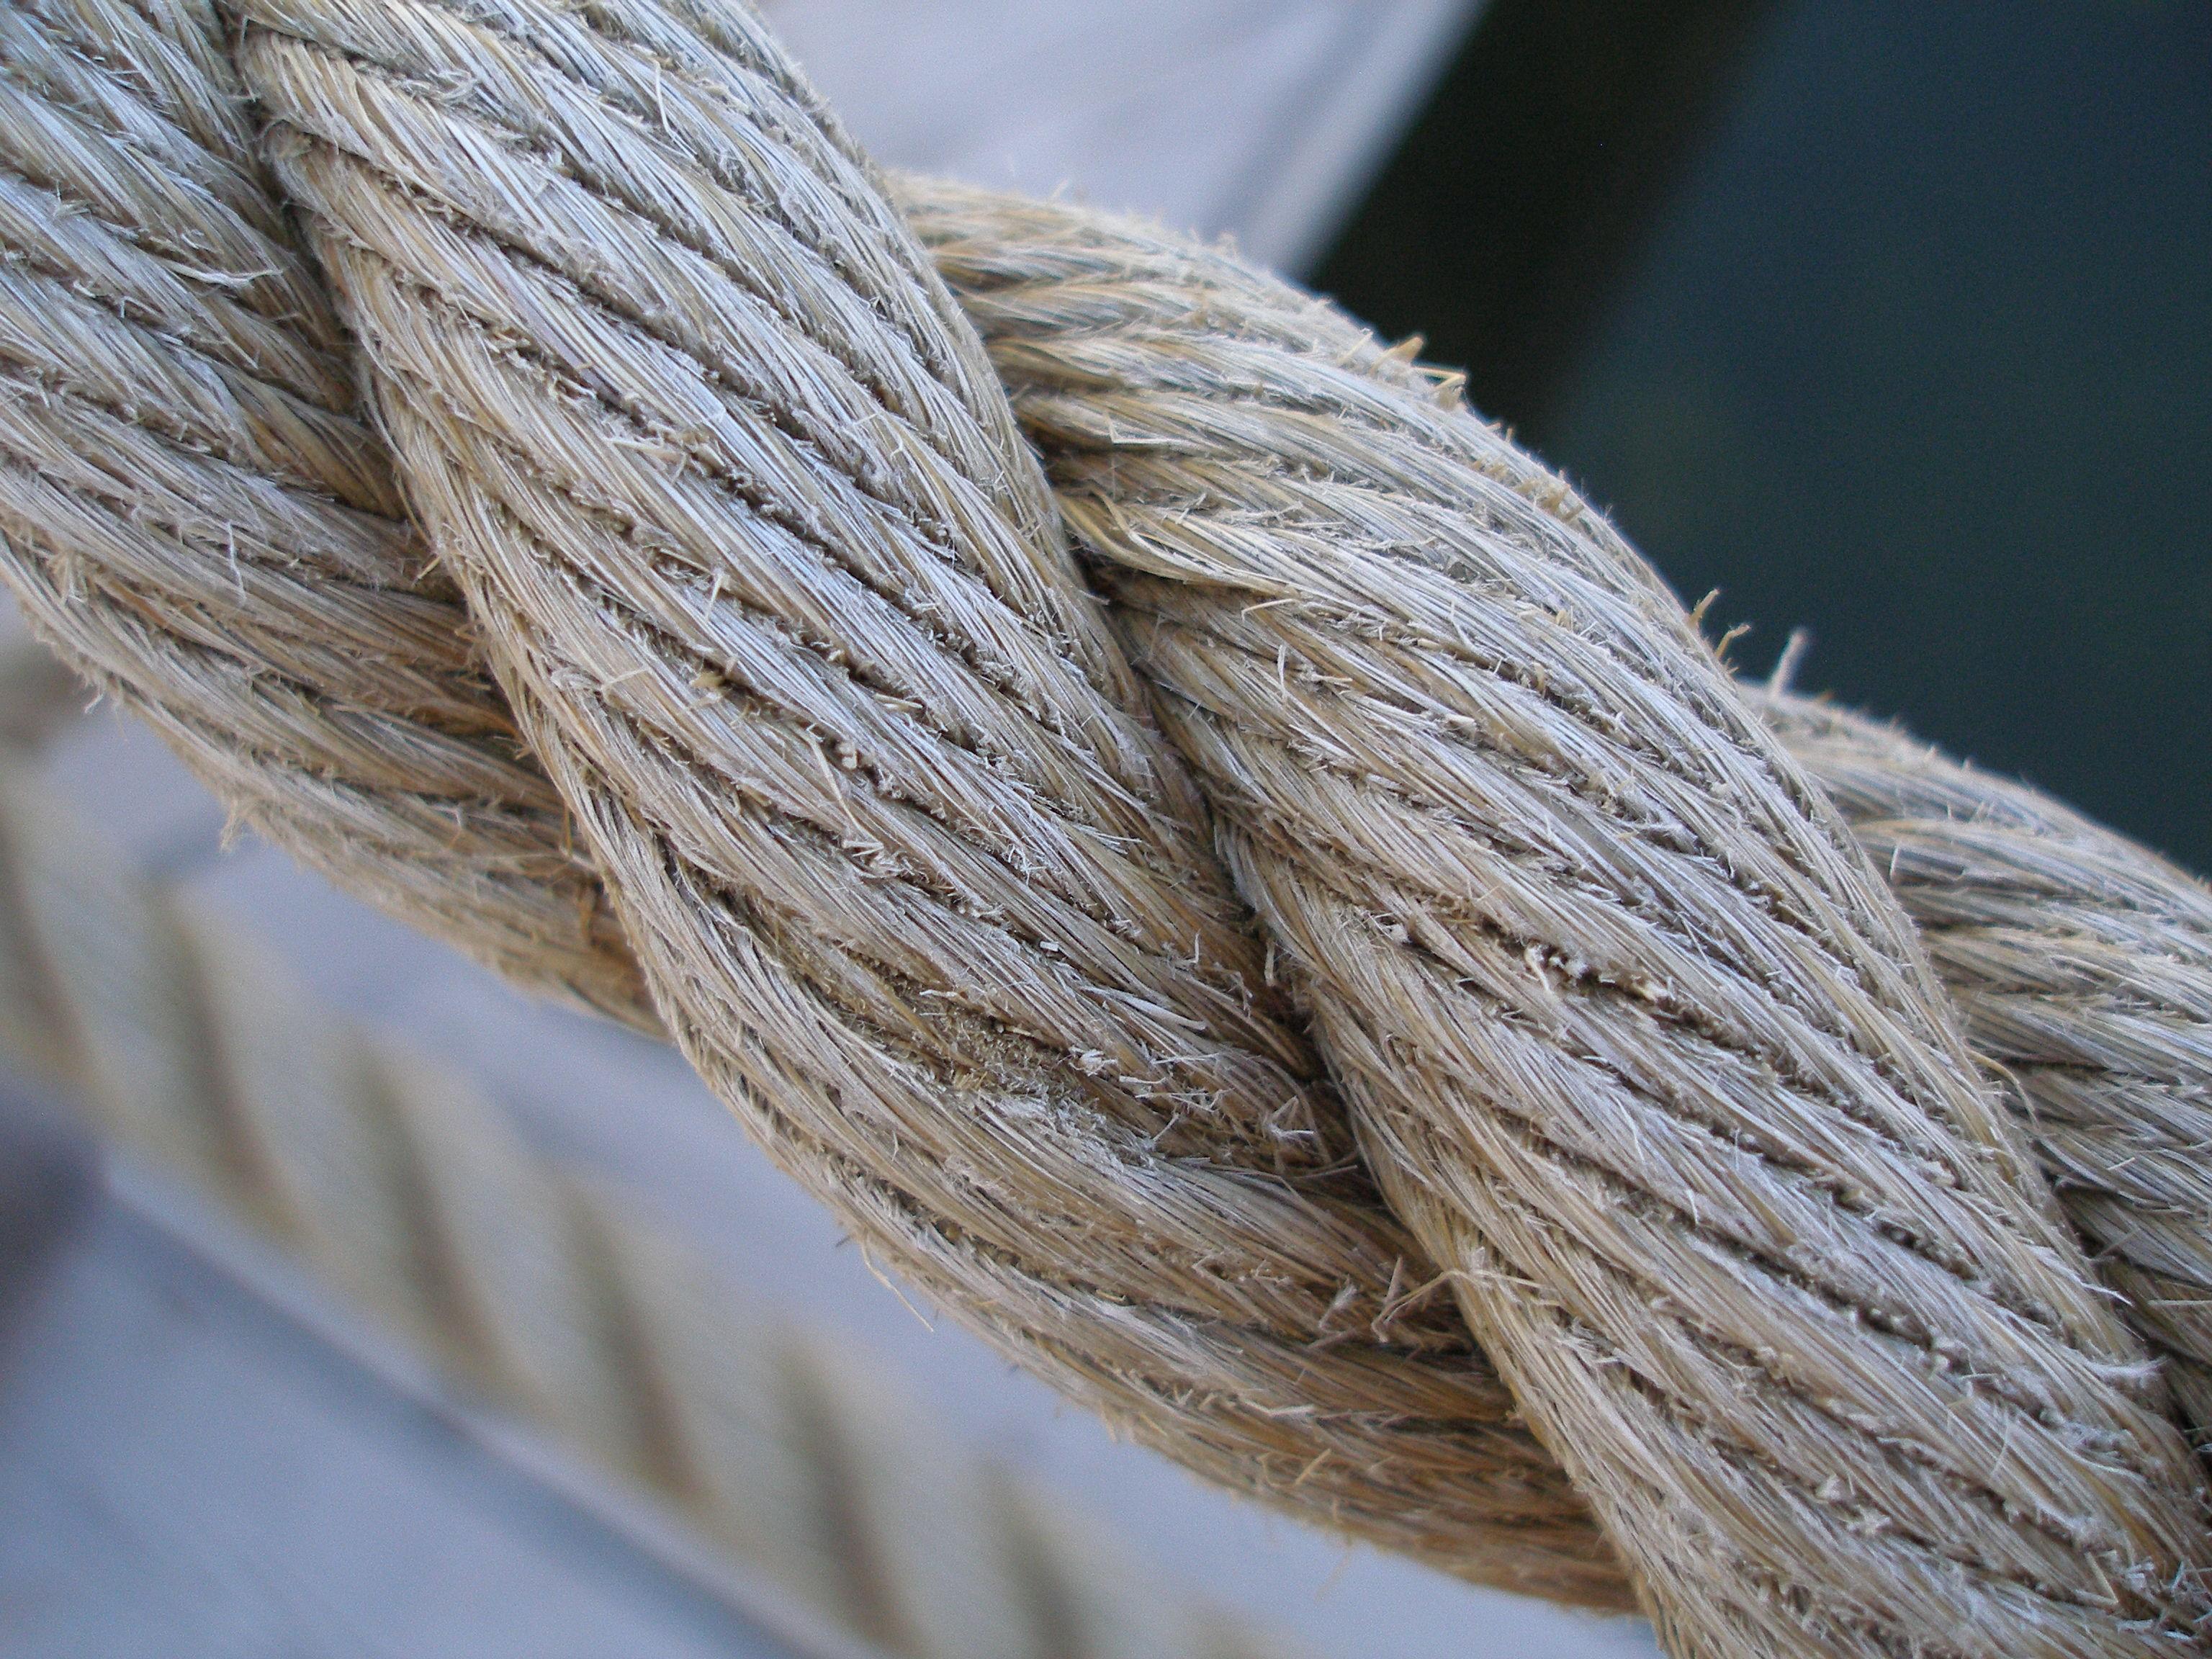 Natural rope - Wikipedia